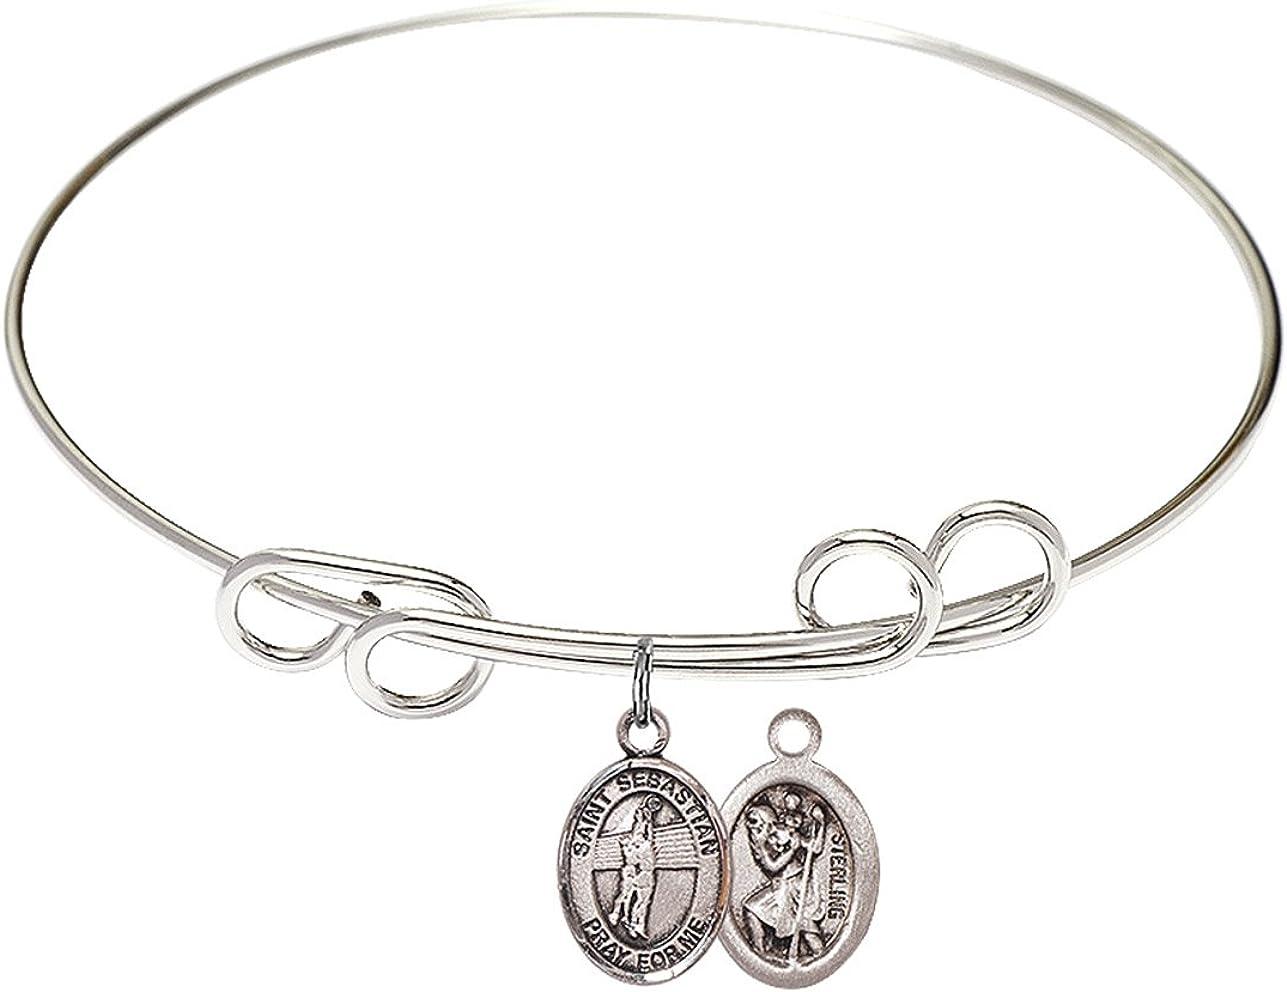 8 half inch Round Double Loop Bangle Bracelet with St. a Sebastian half